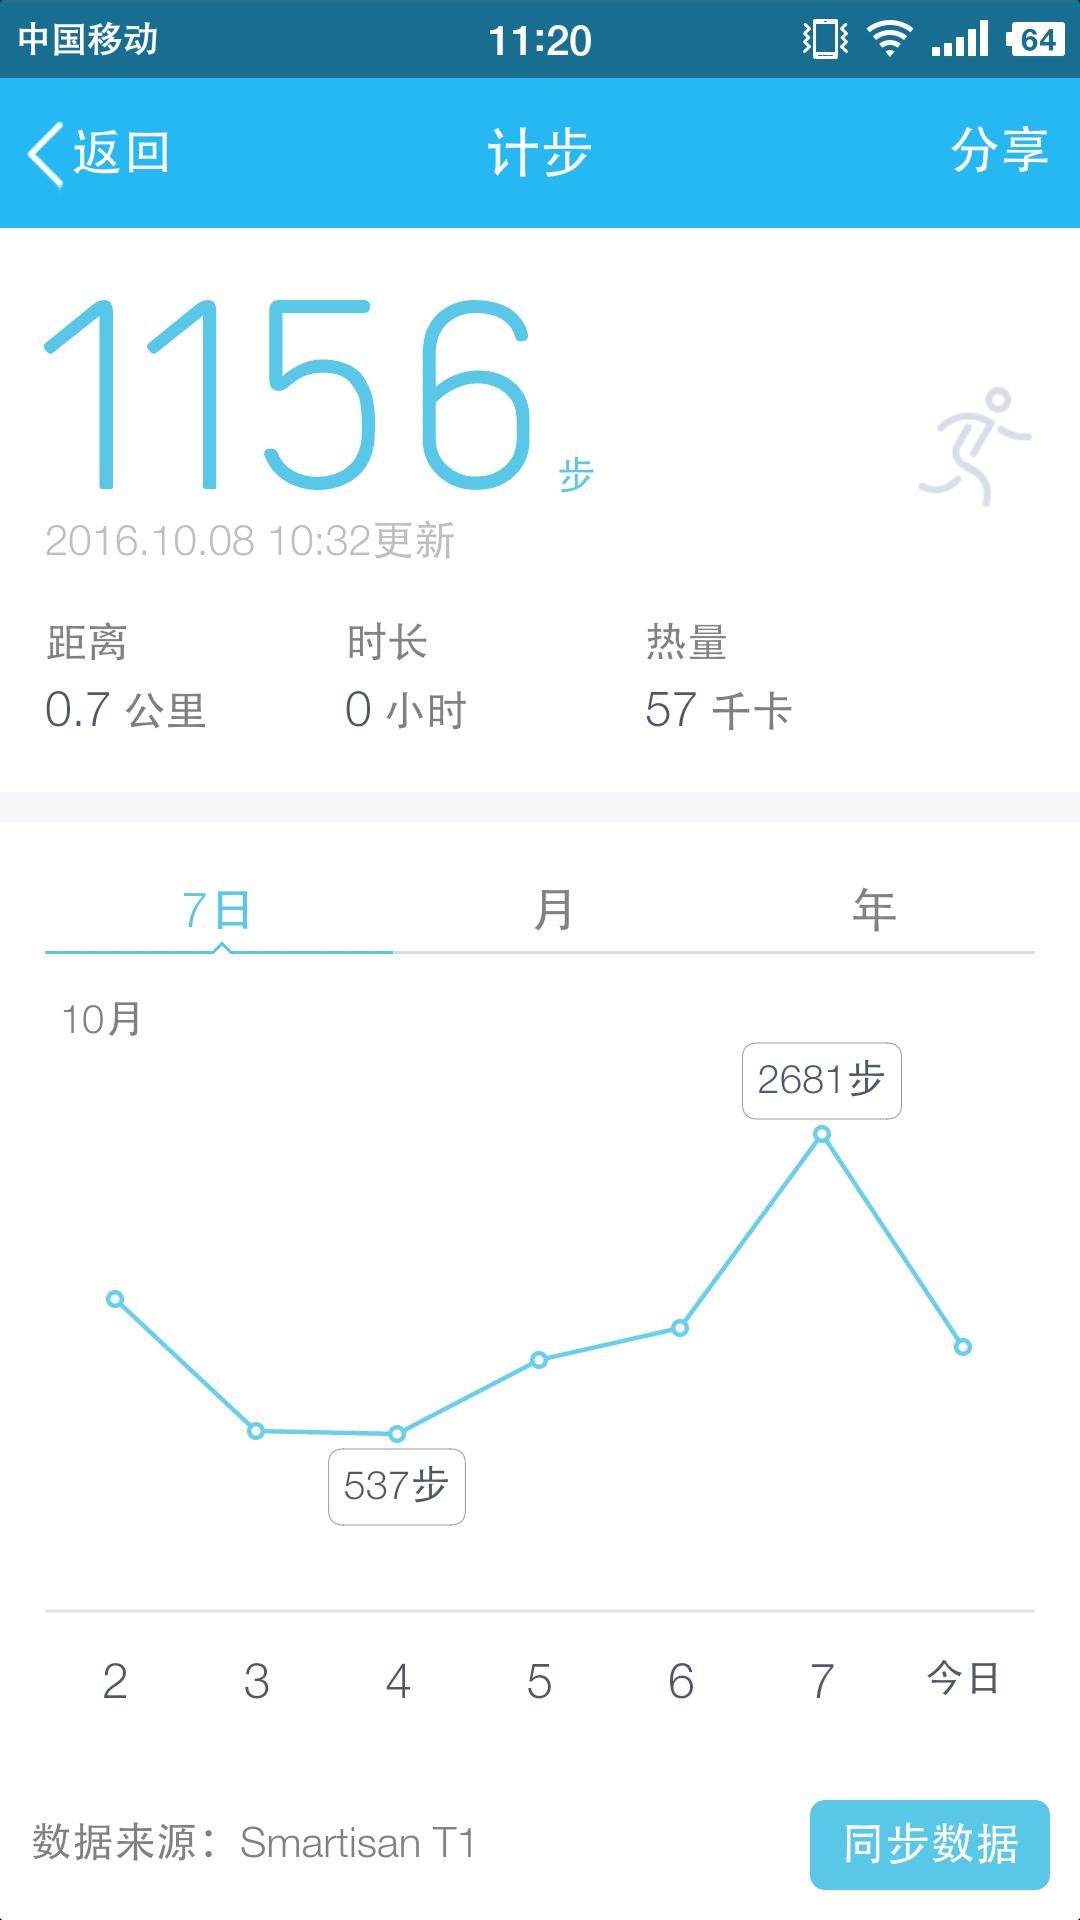 Screenshot_2016-10-08-11-20-18-851_QQ.png